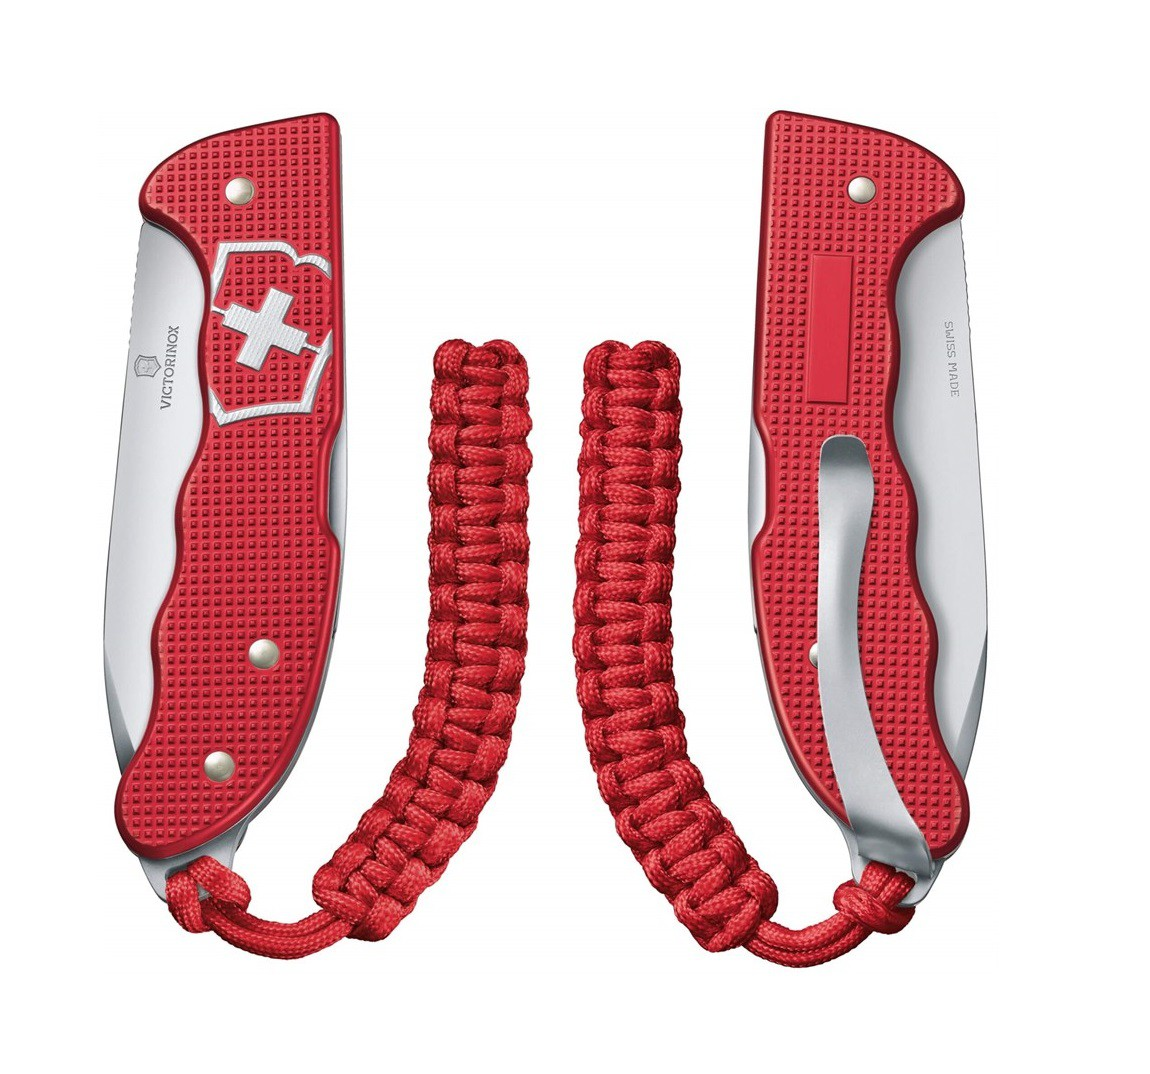 Canivete Suíço Victorinox Tático Hunter Pro Alox Vermelho 0.9415.20  - Mix Eletro